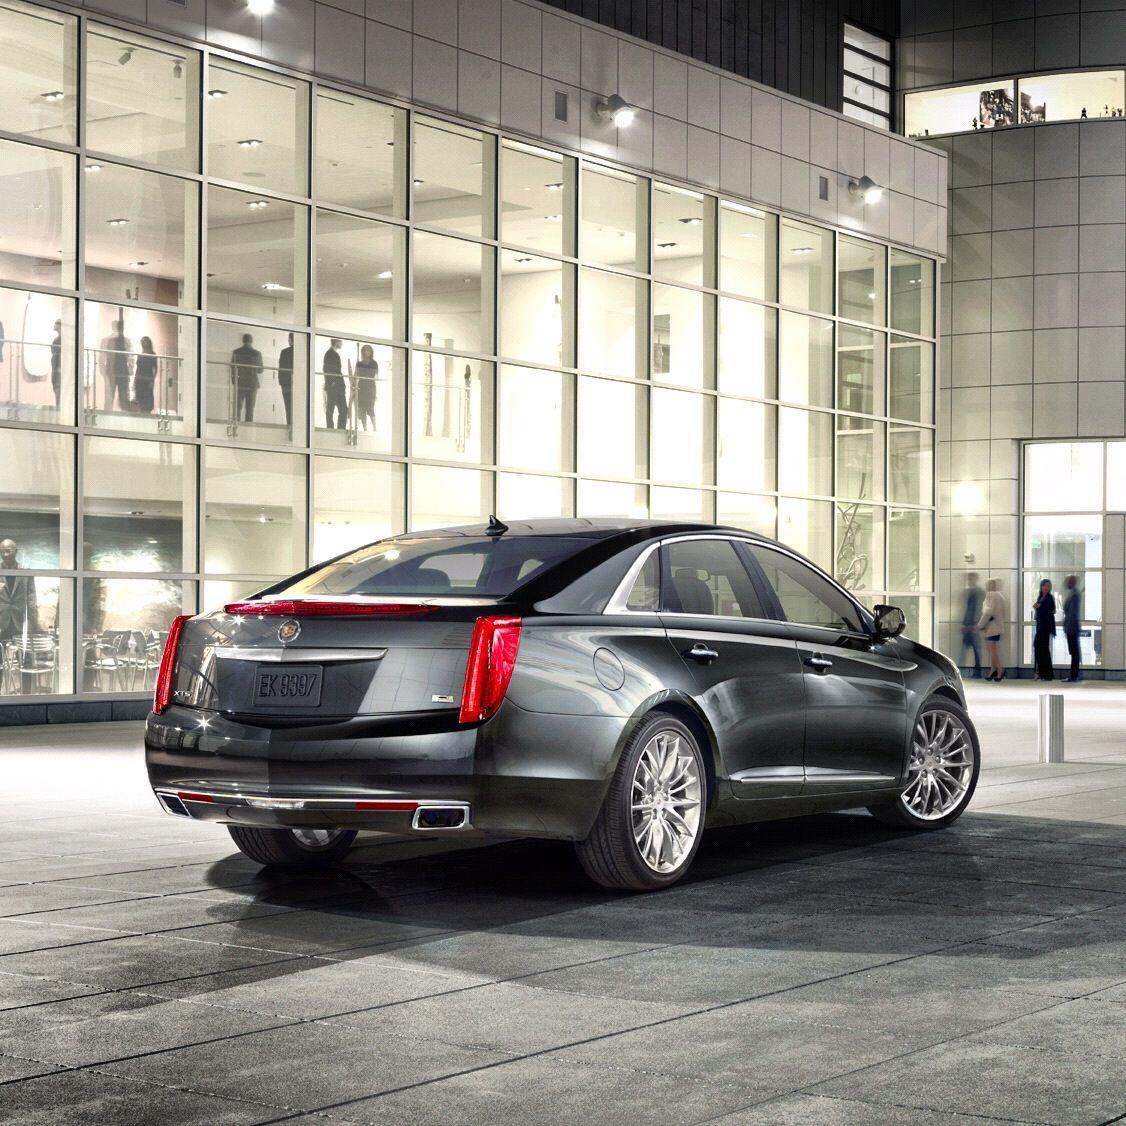 Cadillac Cts For Sale Utah: Pin On Cadillac